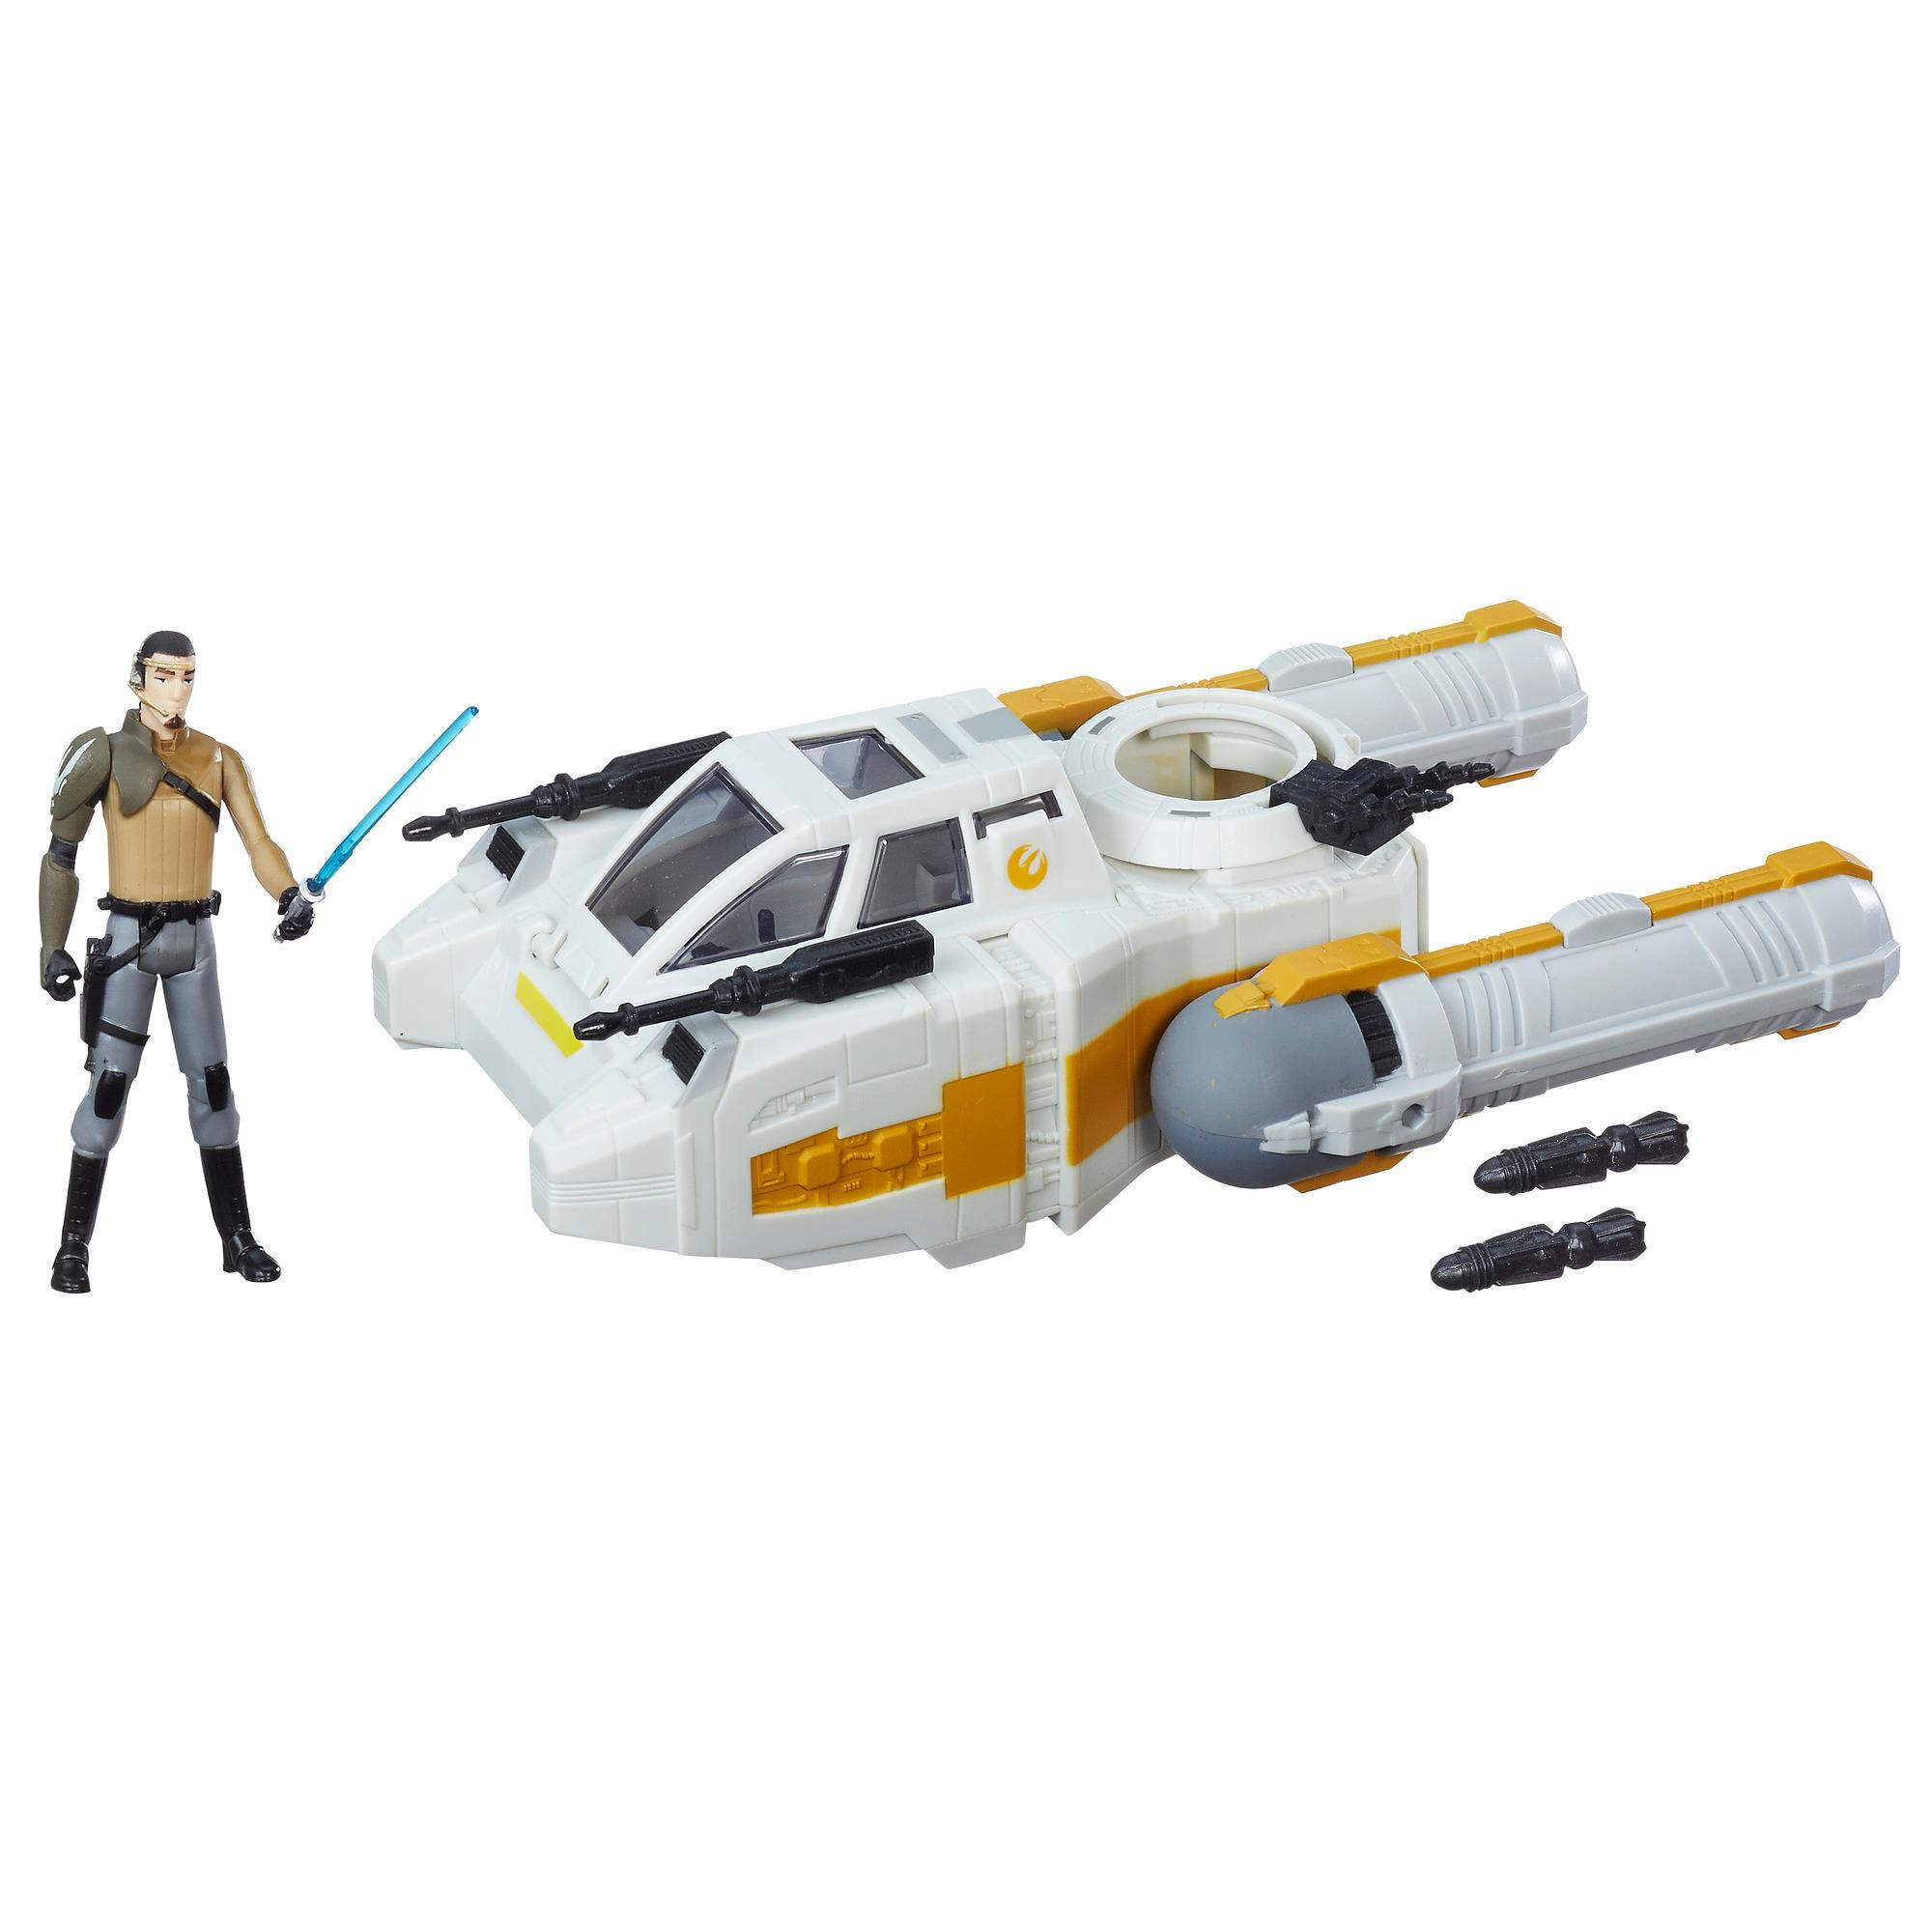 Star Wars: Rebels - Bombardier éclaireur Y-Wing